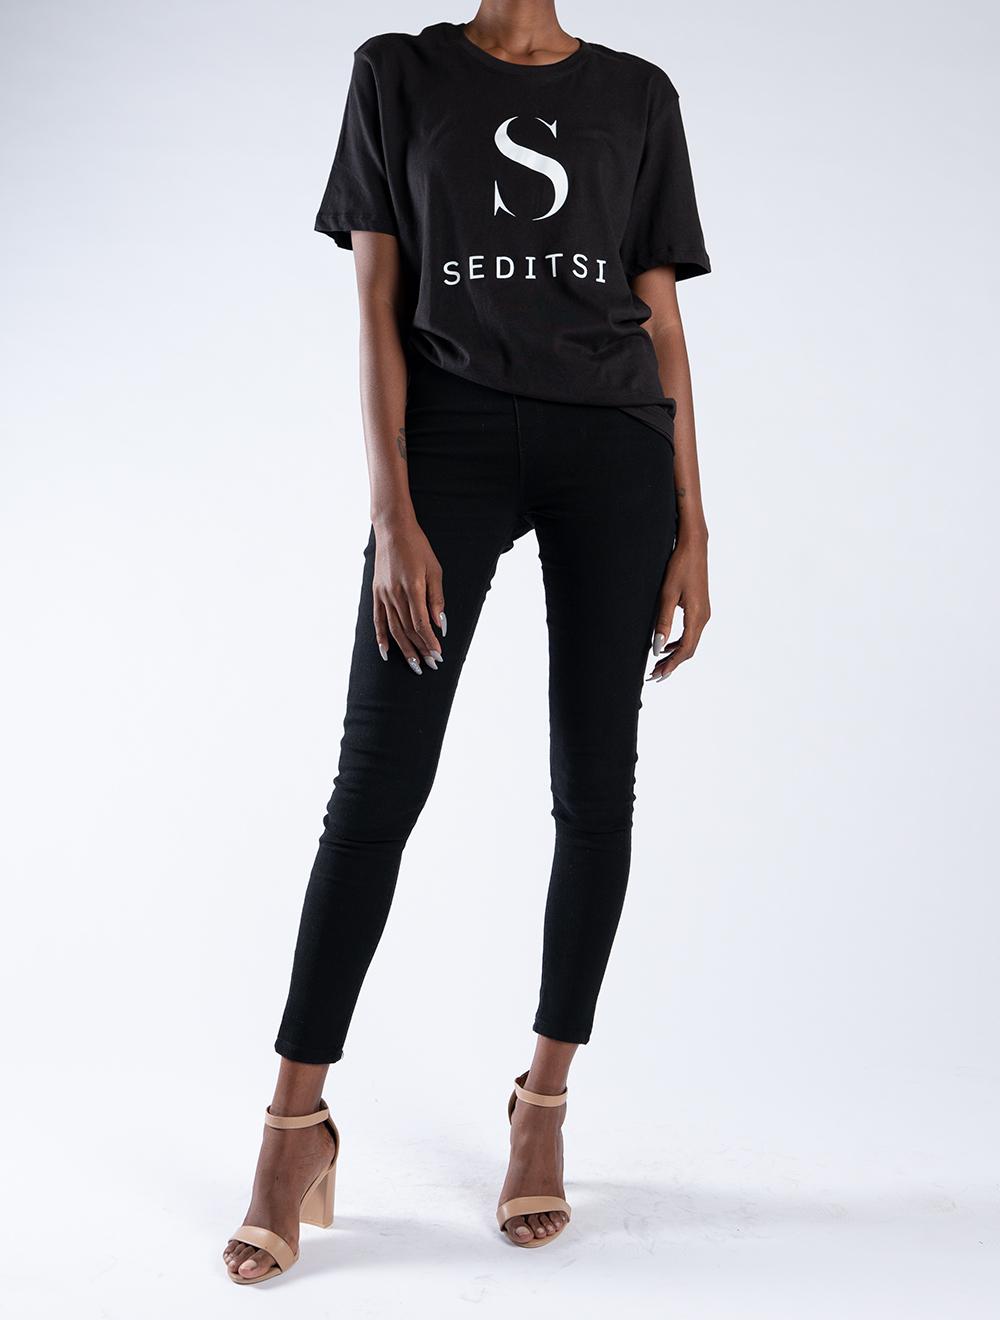 Seditsi Original Ladies T-shirt – Black – Front